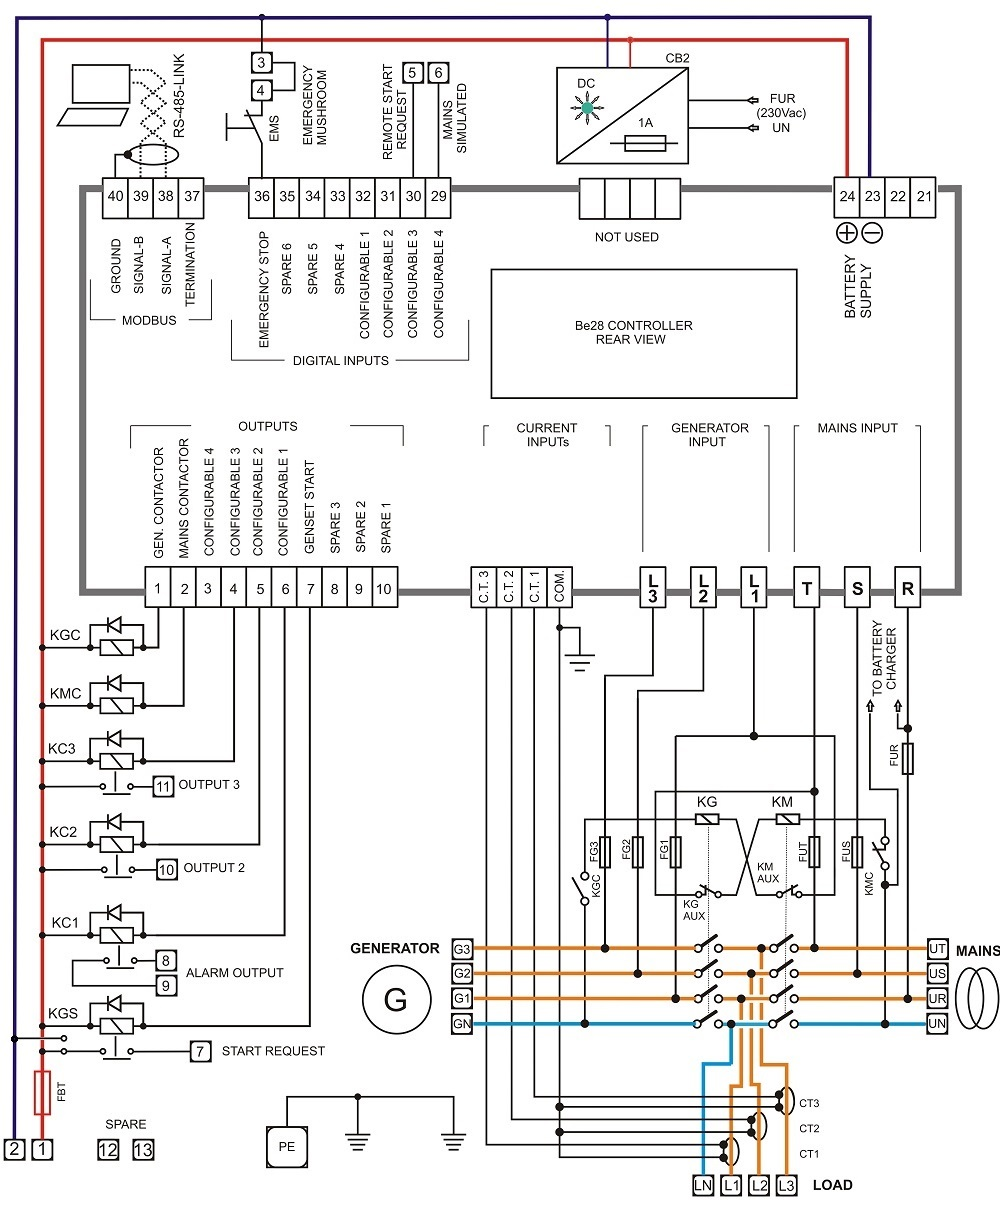 Xsara Picasso Stereo Wiring Diagram : Citroen xsara picasso electrical diagram somurich